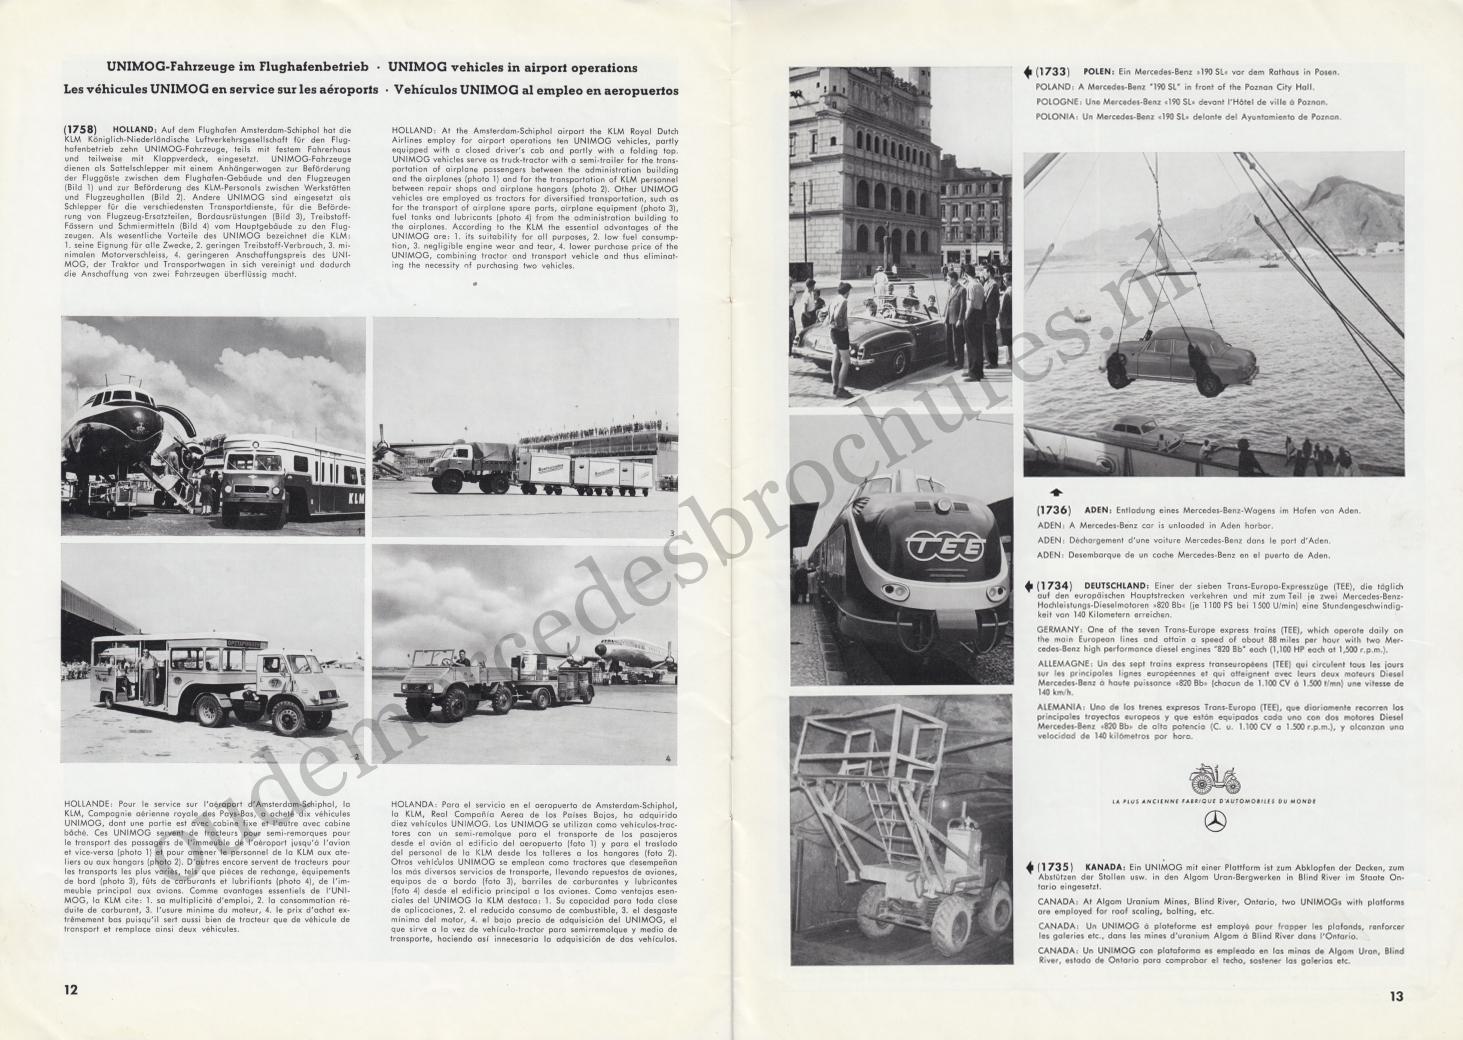 (REVISTA): Periódico In aller welt n.º 13 - Mercedes-Benz no mundo - 1957 - multilingue 007